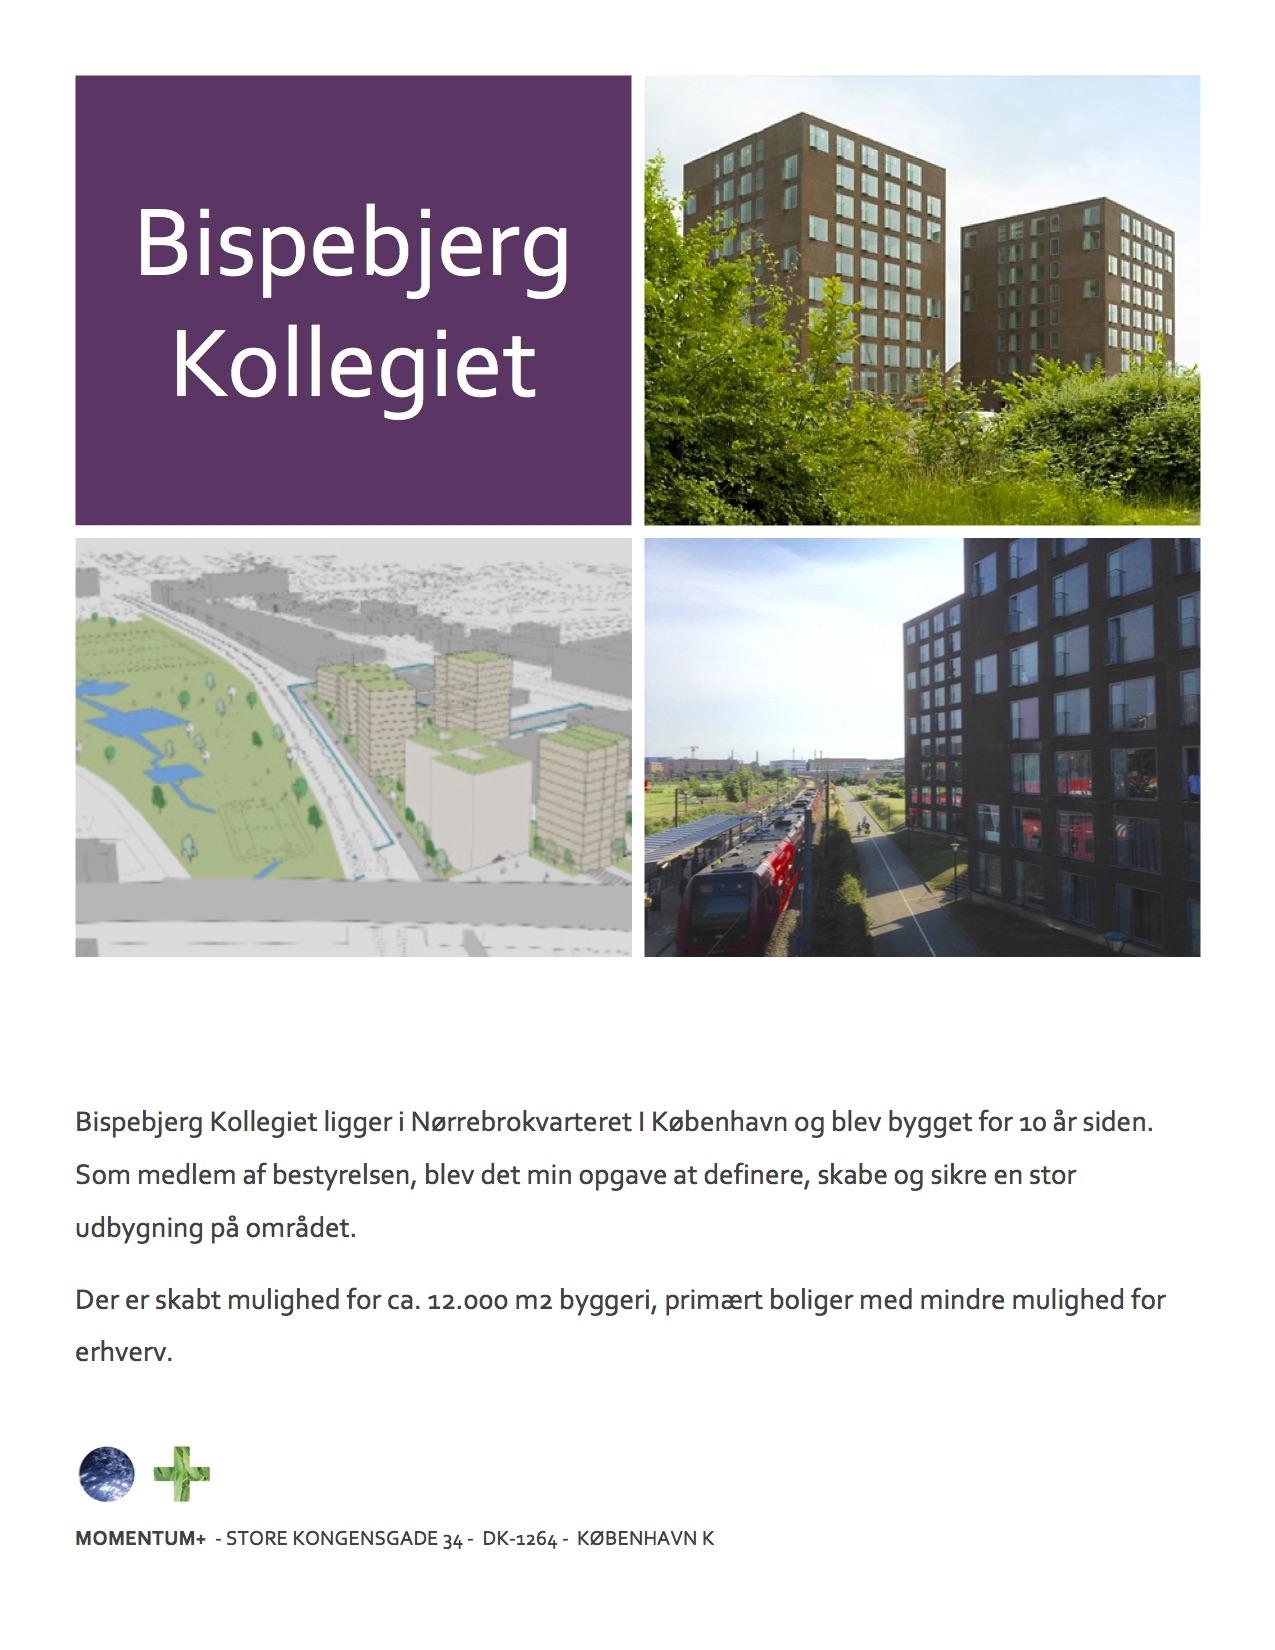 Bispebjerg Kollegiet - 2 ref. -1.jpg